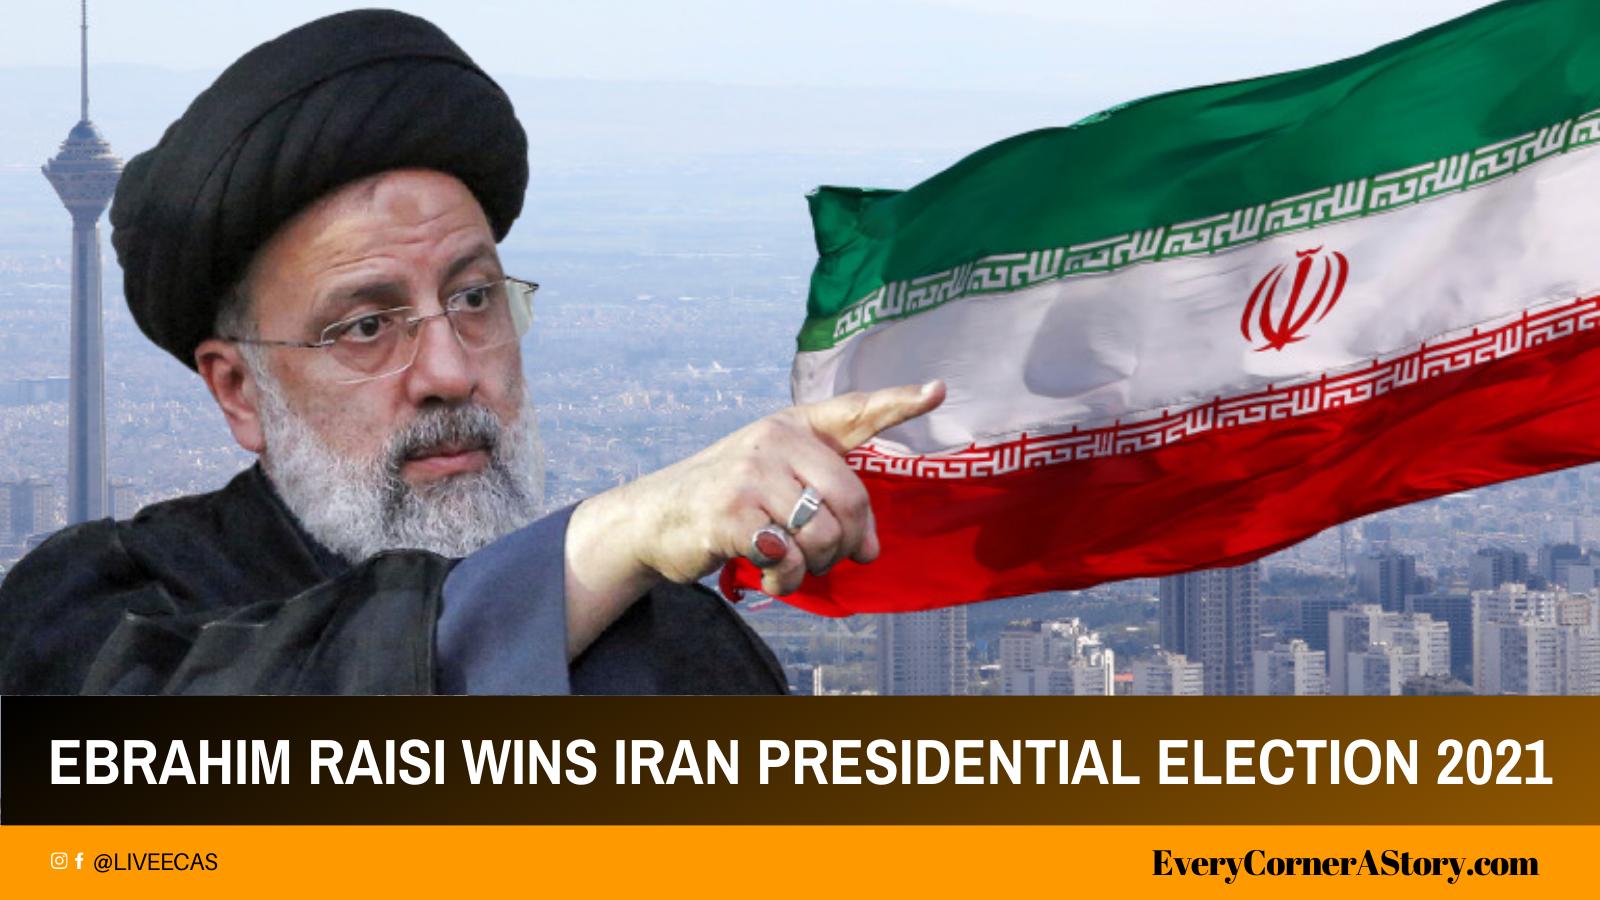 Ebrahim Raisi Wins Iran Presidential Election 2021